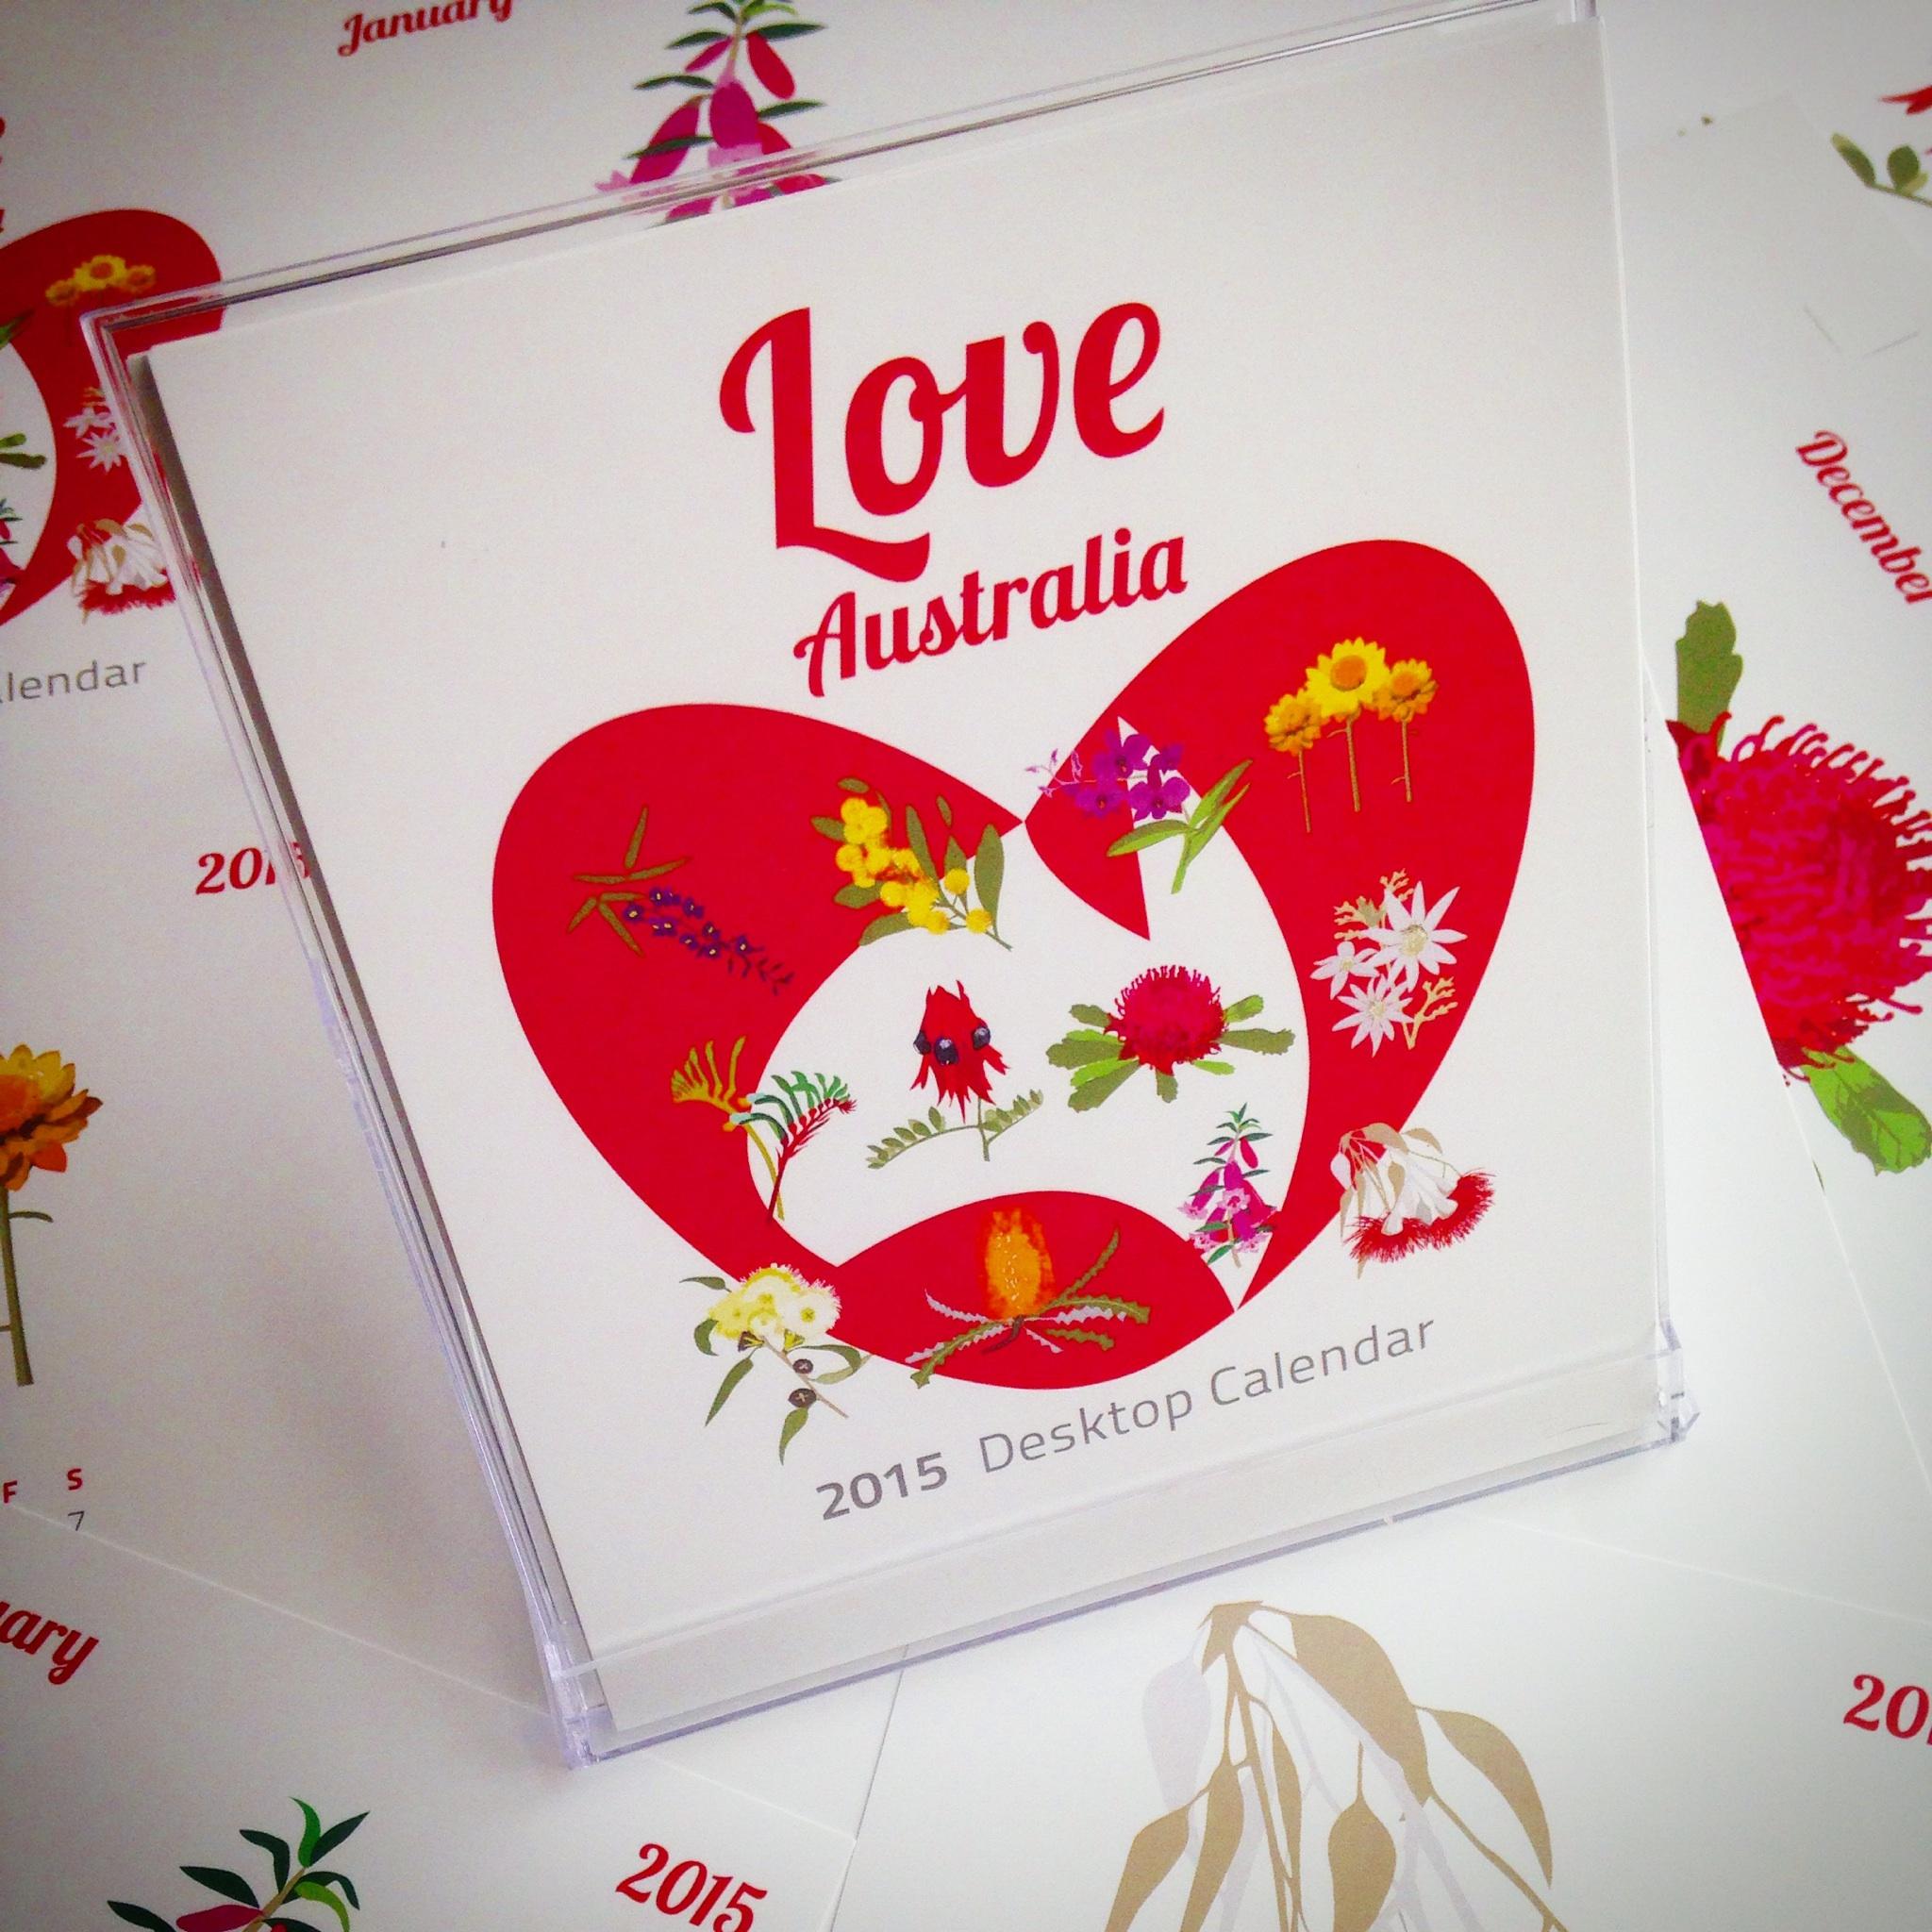 'Love Australia' 2015 Desktop calendar. All images copyright johndaveydesign 2014